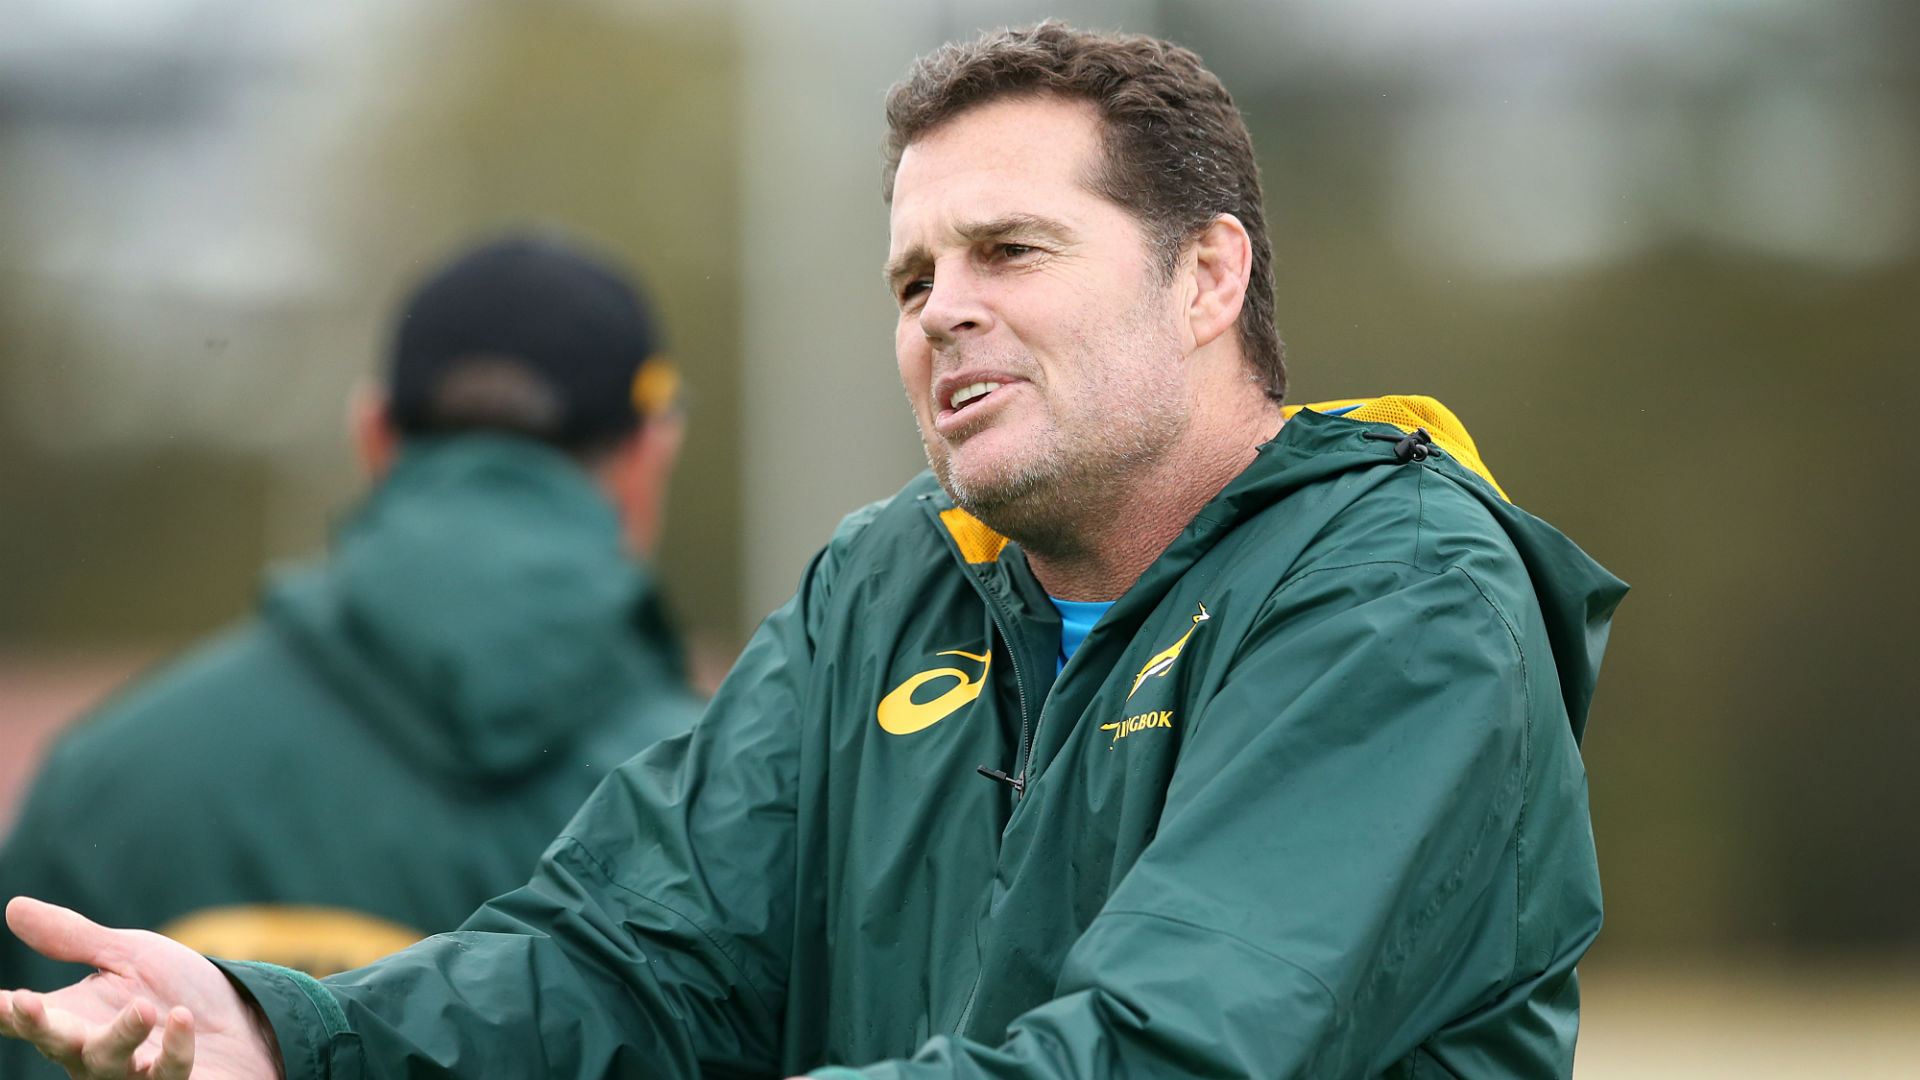 SA coaches to assist franchises